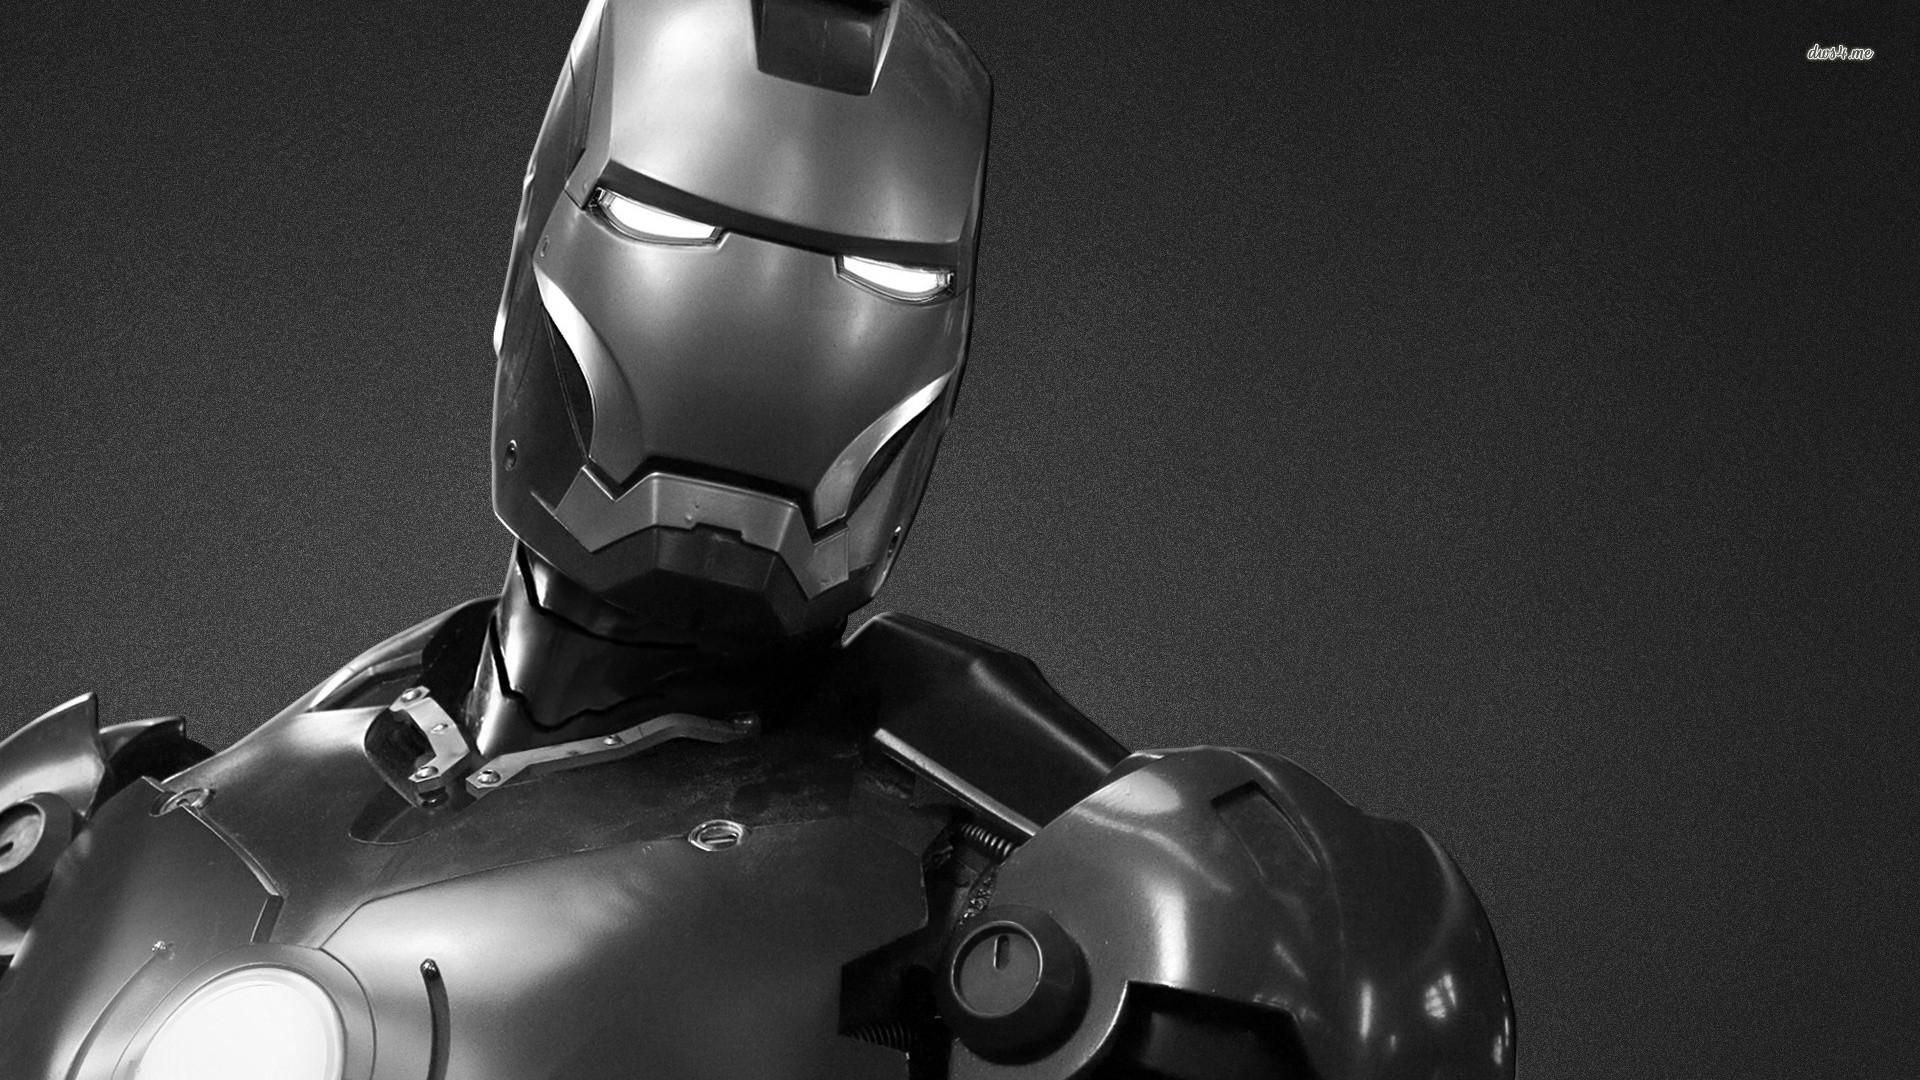 35 iron man hd wallpapers for desktop cartoon district - Iron man cartoon hd ...